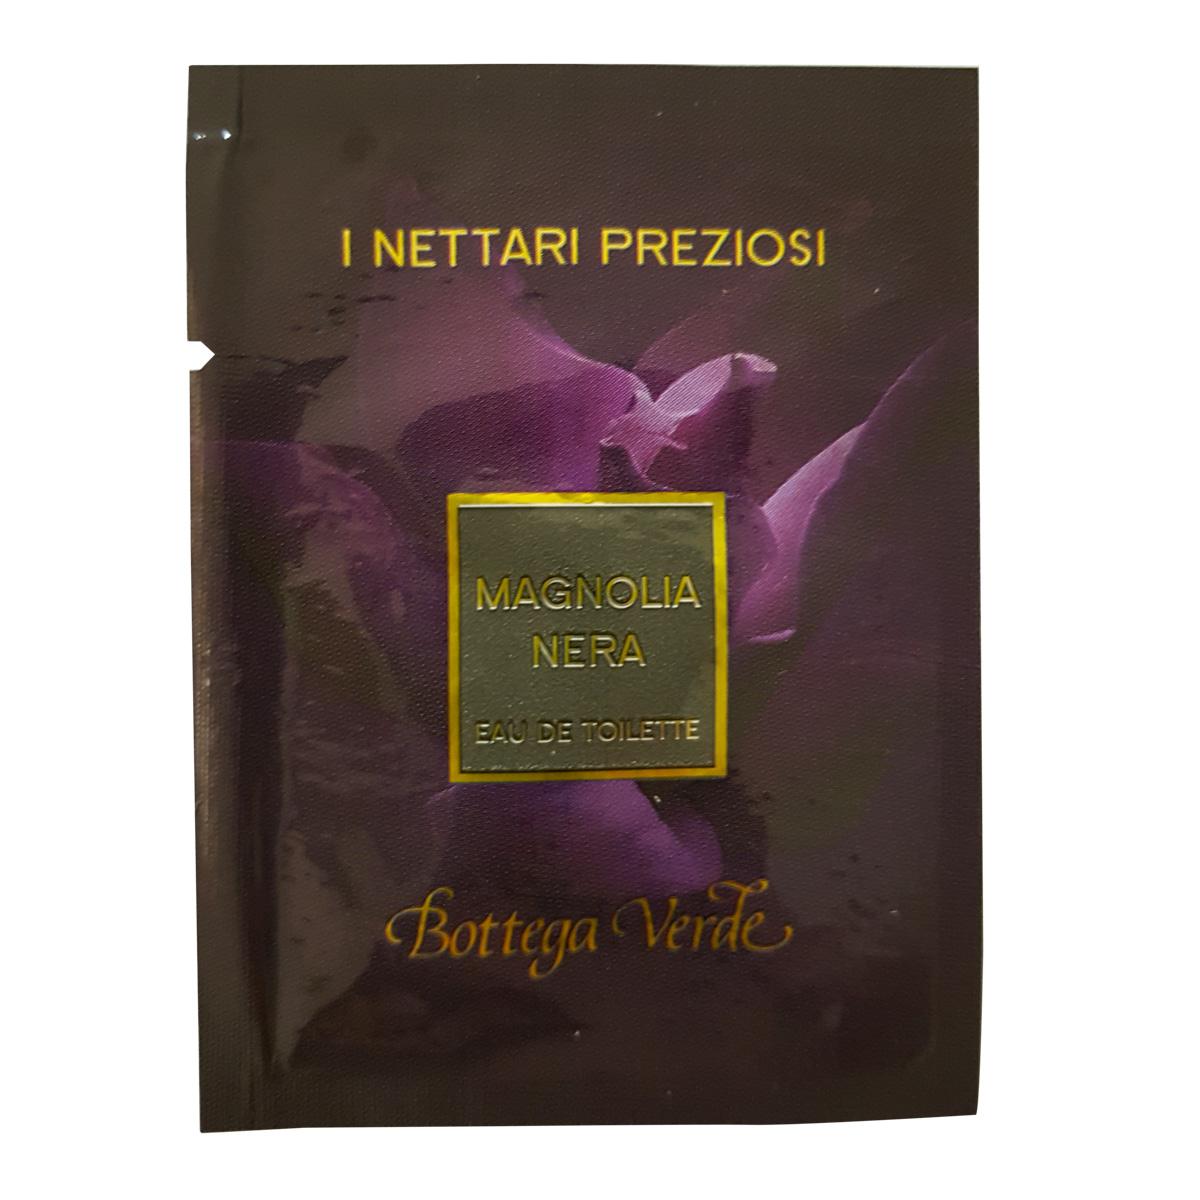 Mostra - Apa de toaleta Magnolia Nera - I Nettari Preziosi, 1 ML